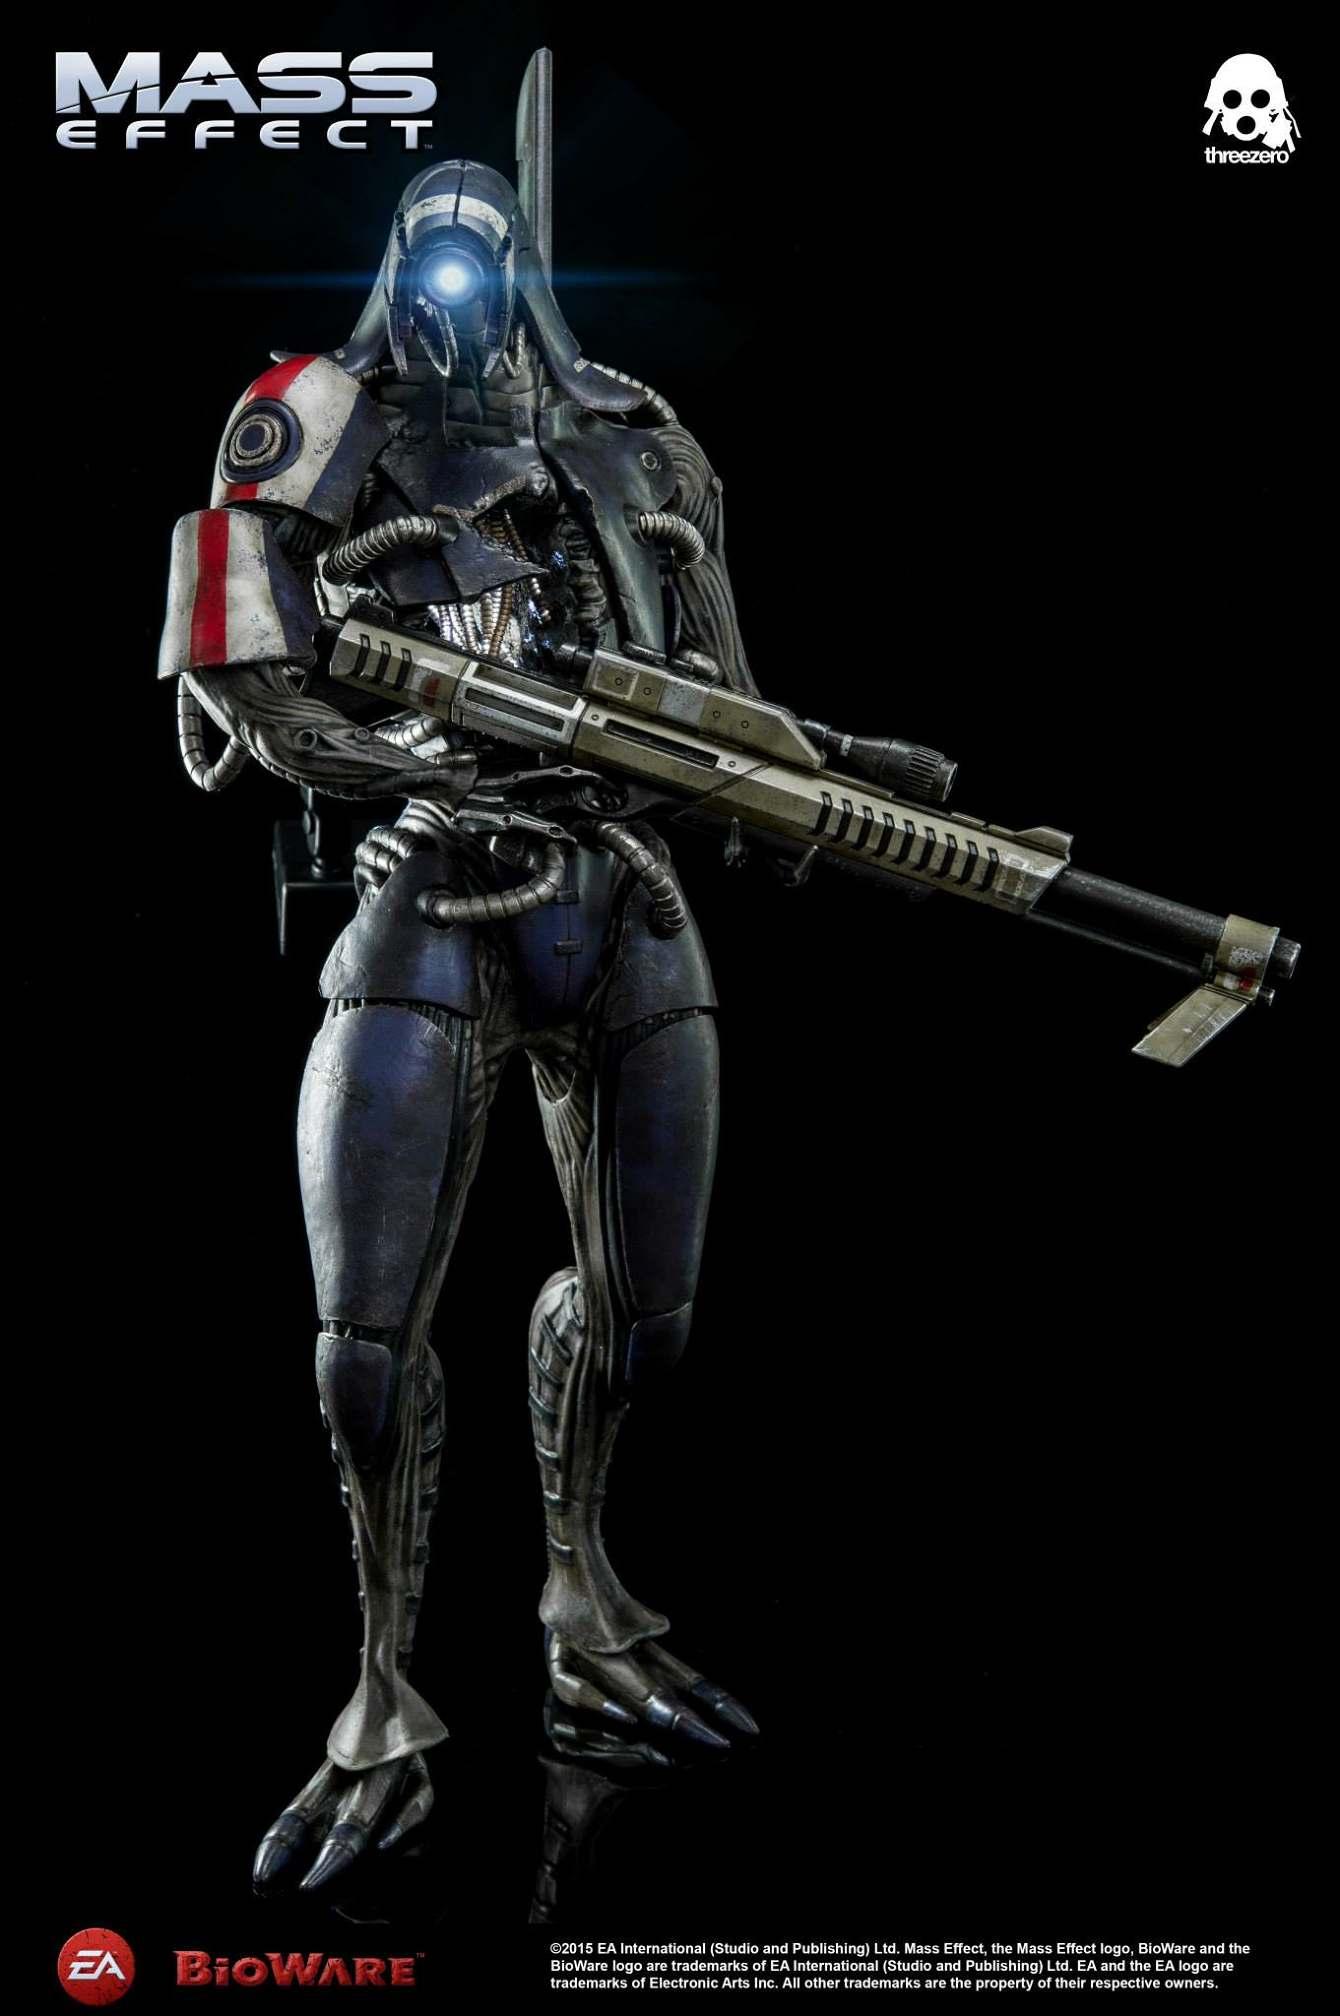 ThreeZero-Bioware-video-game-Legion-Mass-Effect-figure-19_1340_c.jpg